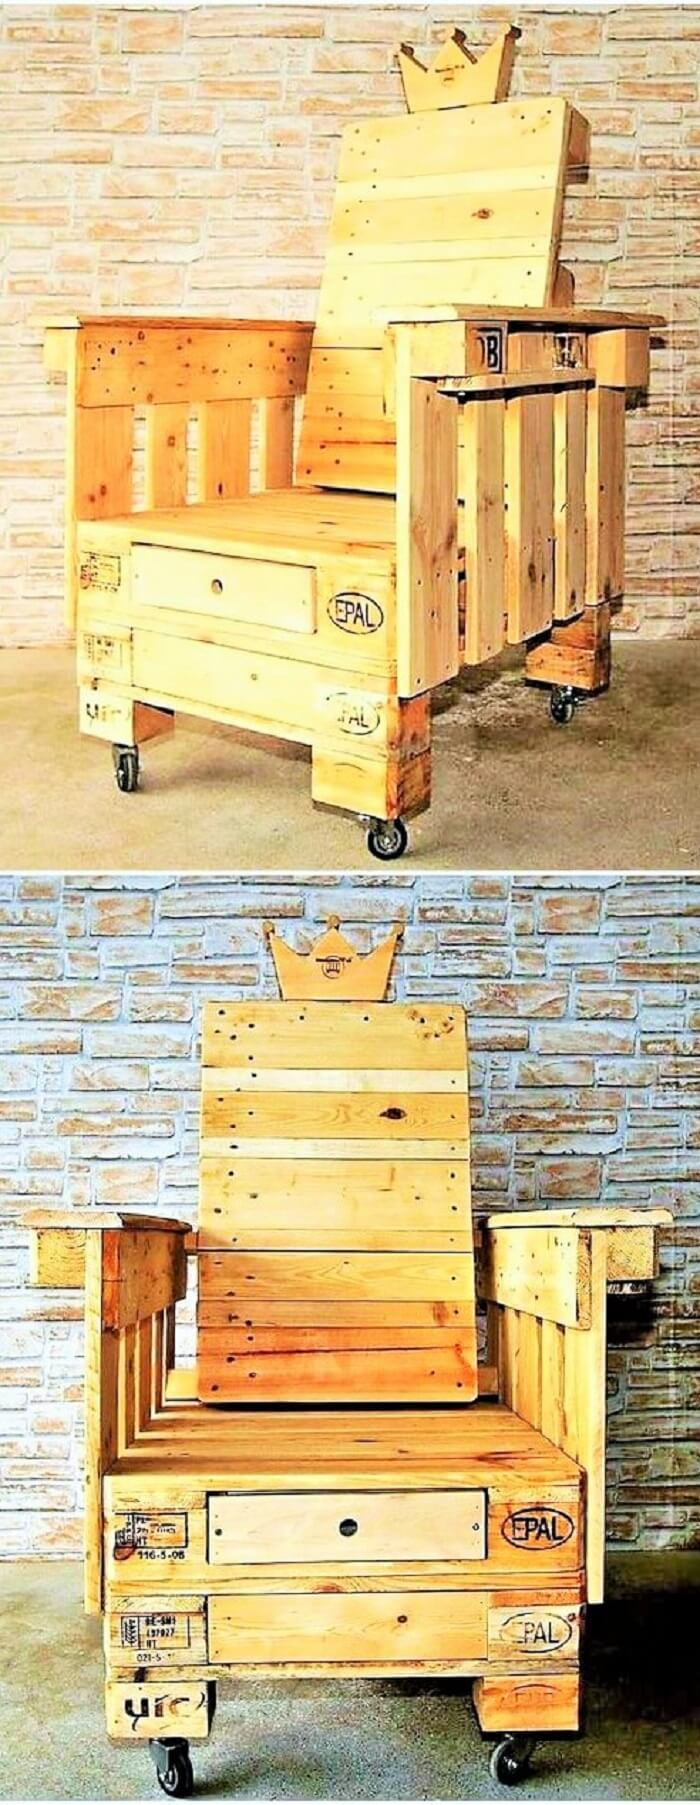 Diy-Wooden-Pallet-Ideas-011